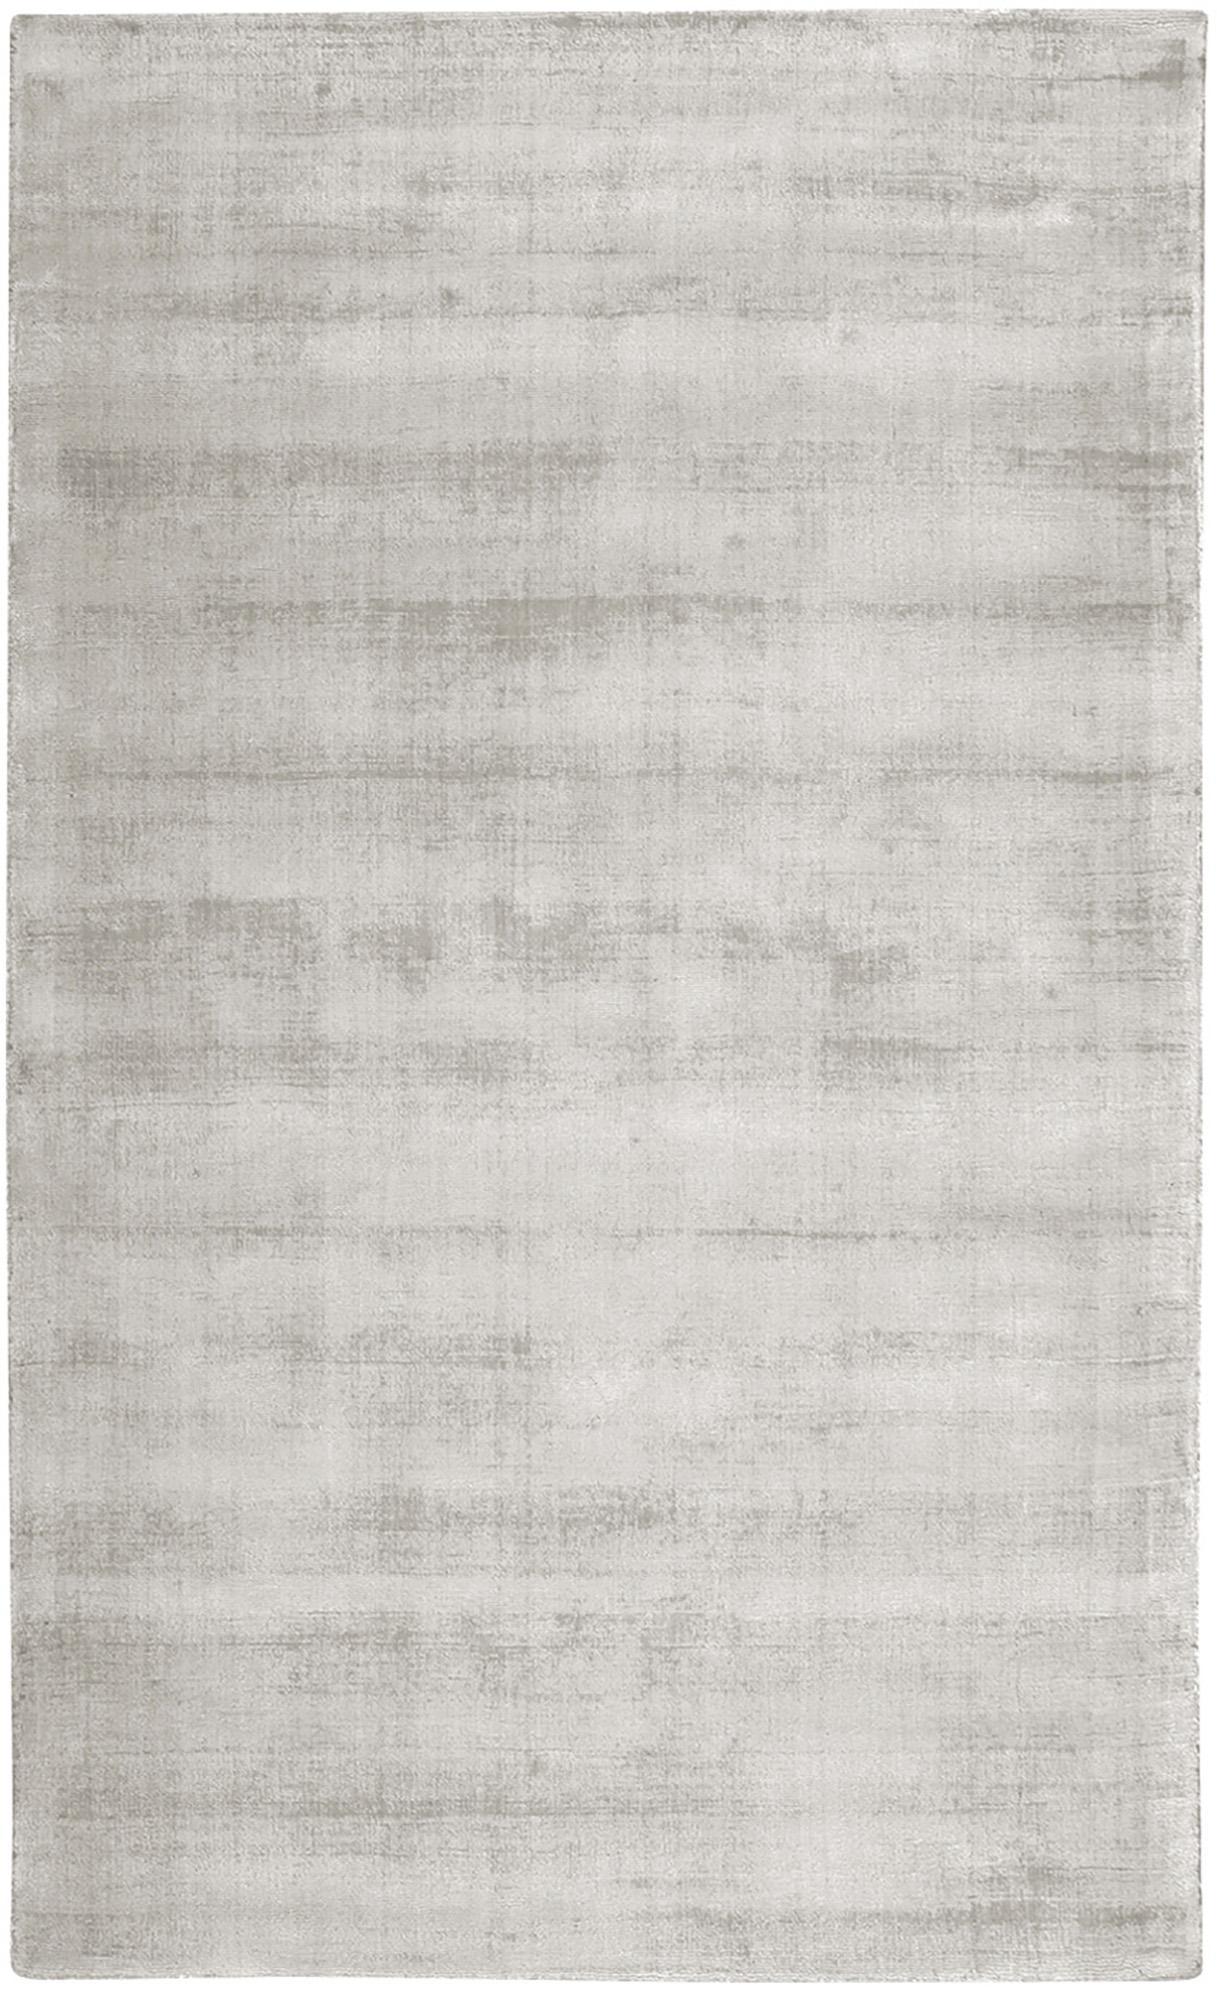 Handgewebter Viskoseteppich Jane in Hellgrau-Beige, Flor: 100% Viskose, Hellgrau-Beige, B 90 x L 150 cm (Grösse XS)